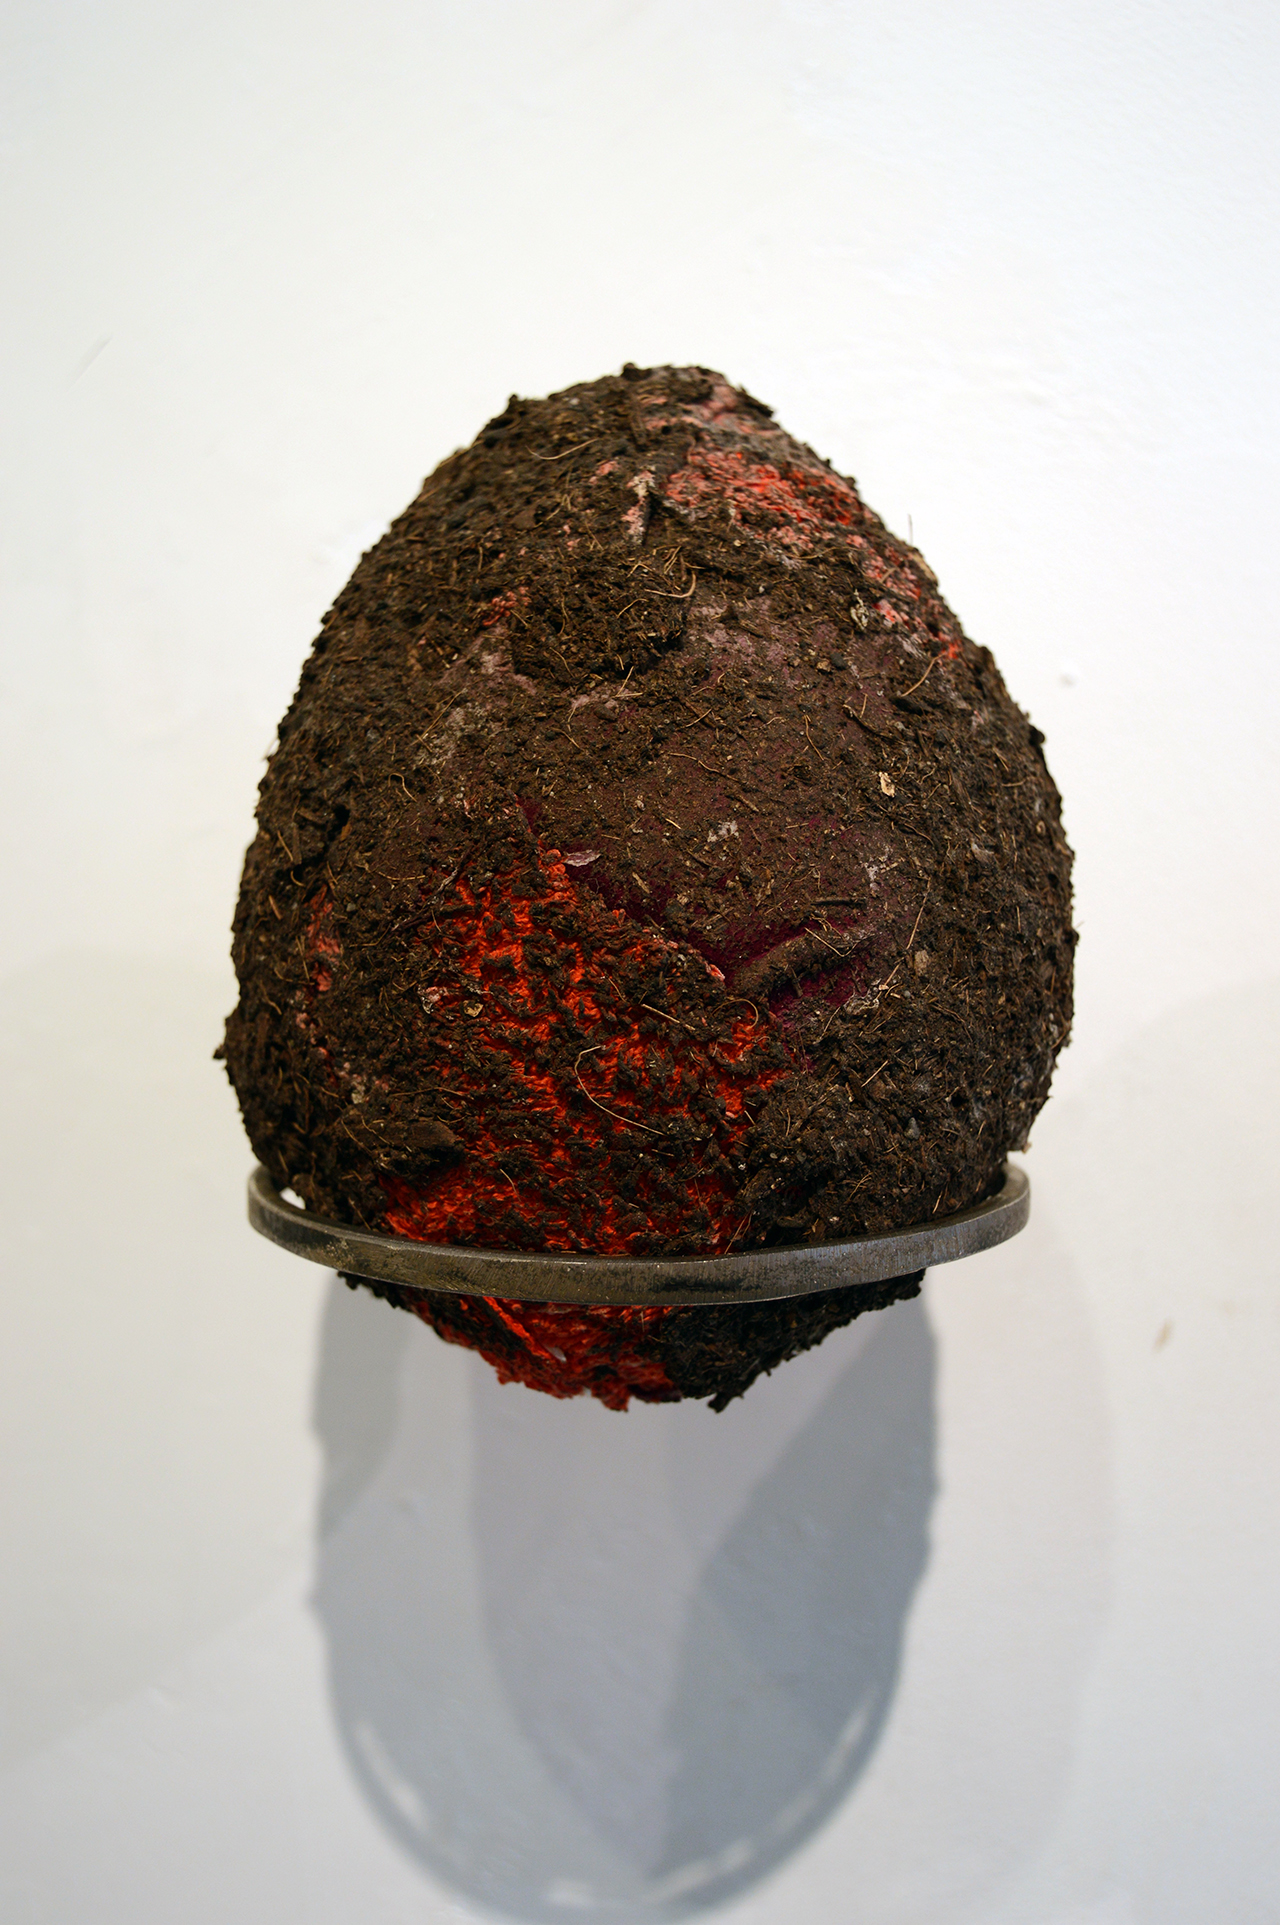 "Pedro Wirz  Ovo por Olho - ""An Egg for an Eye"" (Humus)  Humus, old fabric, latex acrylic medium (metal ring)  16.5 cm x 13 cm x 17 cm ( 6.5 in x 5 in x 6.7 in )  2018"